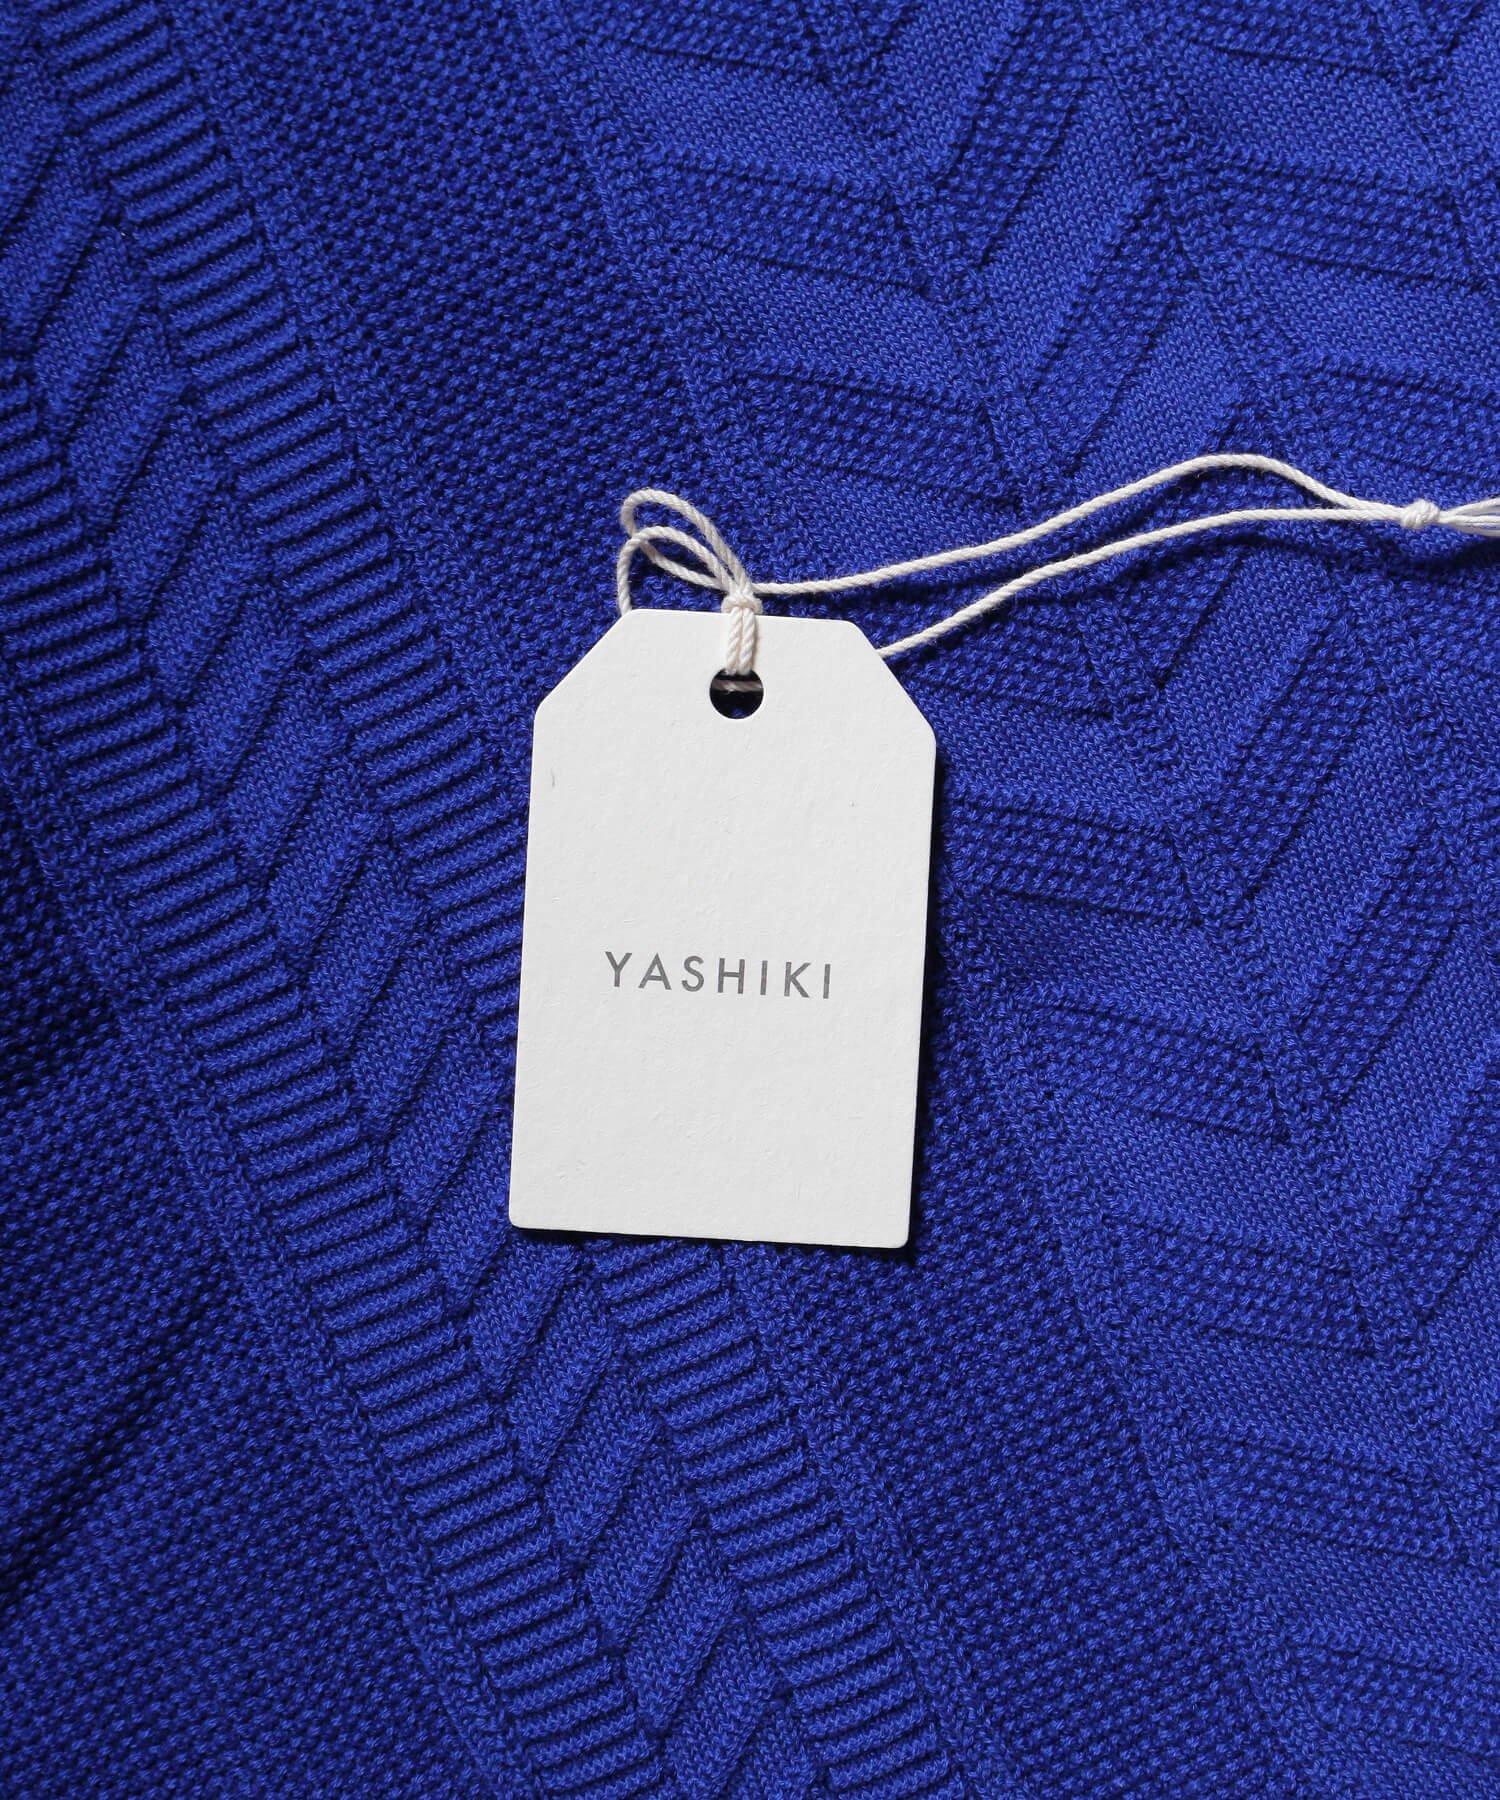 YASHIKI / ヤシキ |YASHIKI / ヤシキ × SIDEMILITIA inc. / サイドミリティア  RYUREI KNIT (LIMITED BLUE/WOMEN'S) 商品画像8